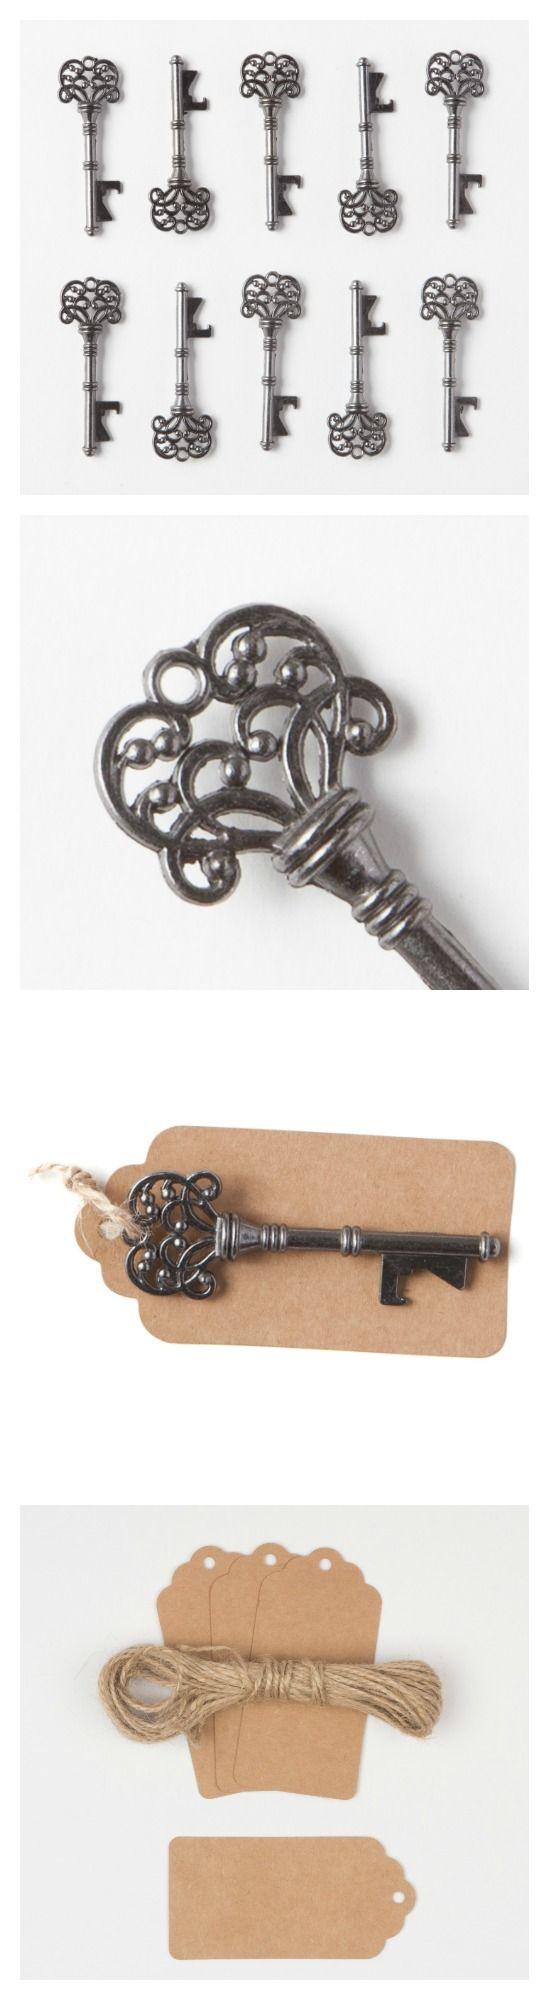 Vintage Key Bottle Openers   Rustic Wedding Favors for Guests ...